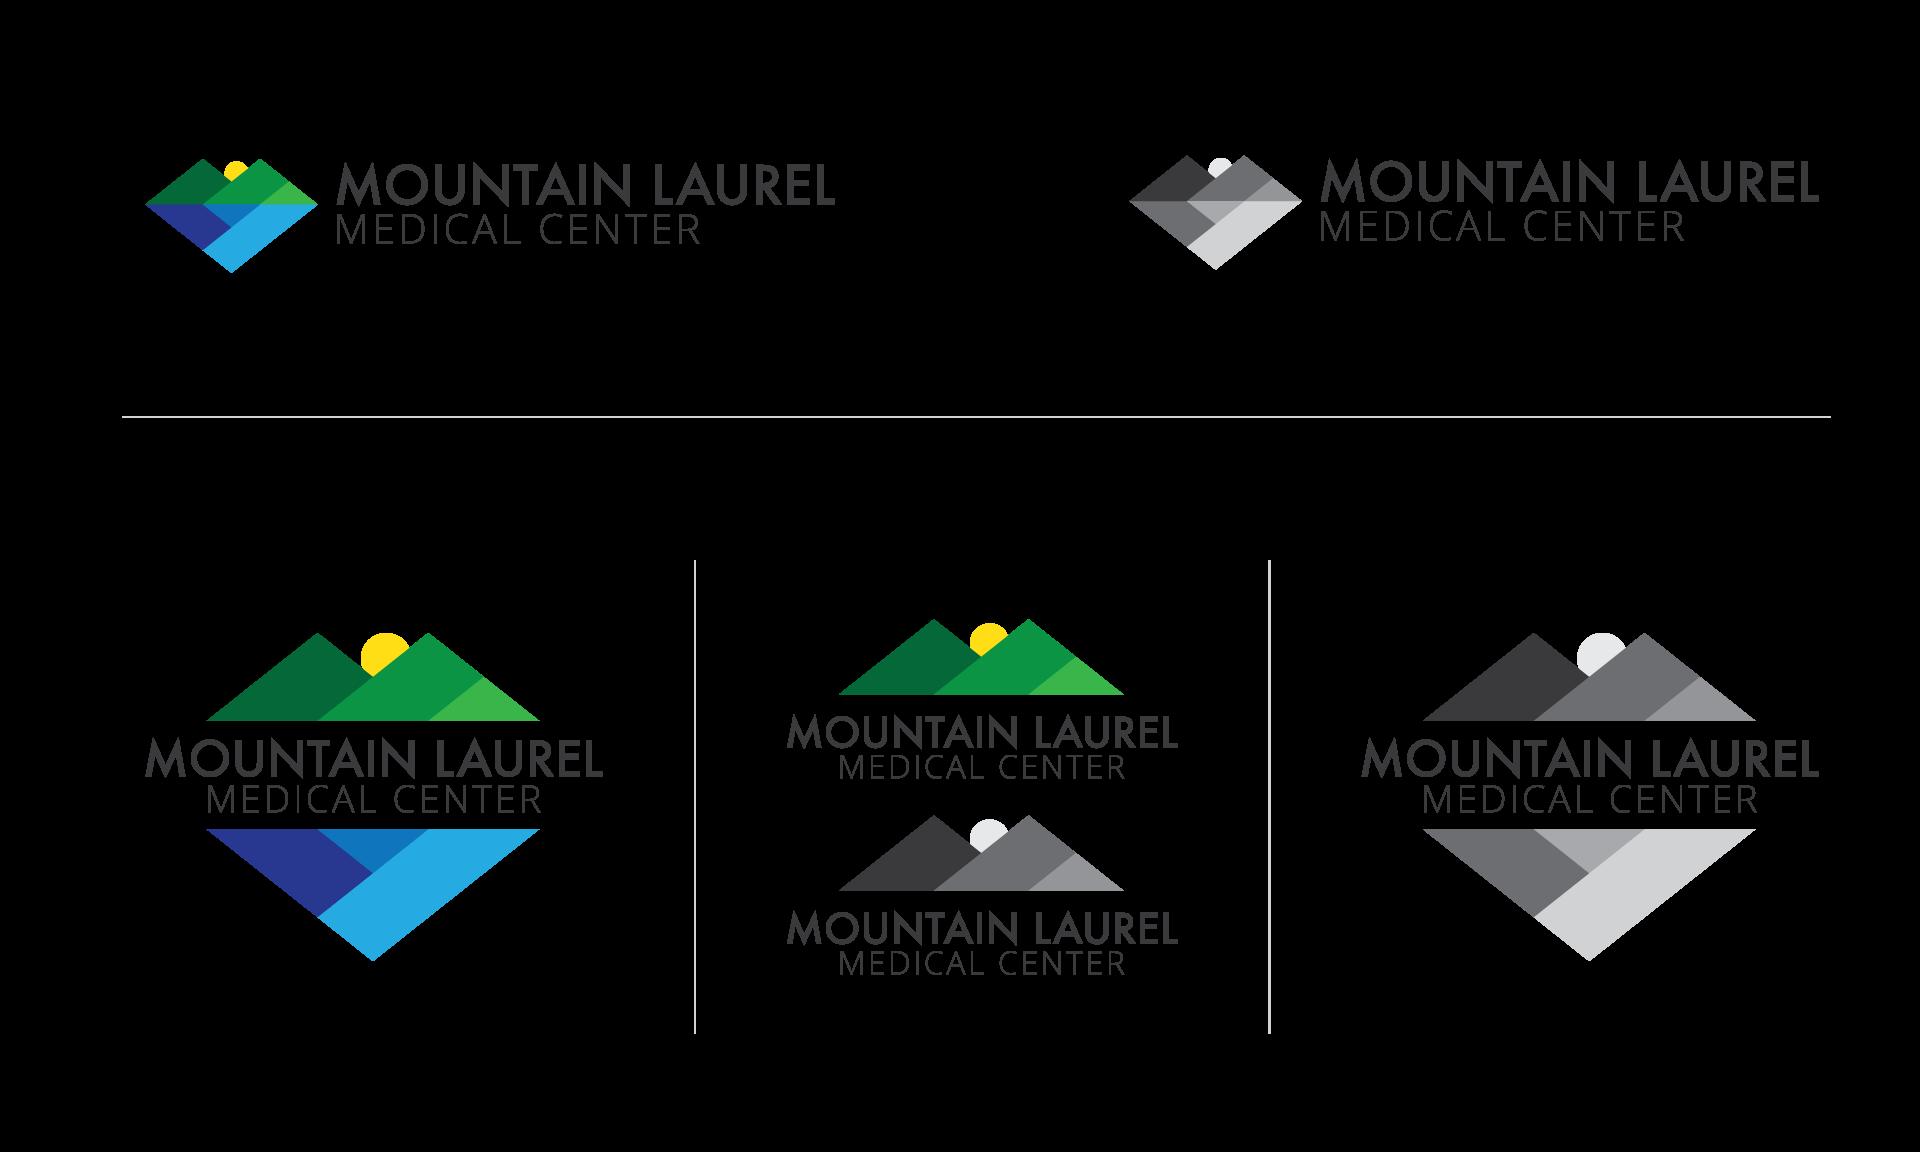 Mountain Laurel Medical Center logo variations